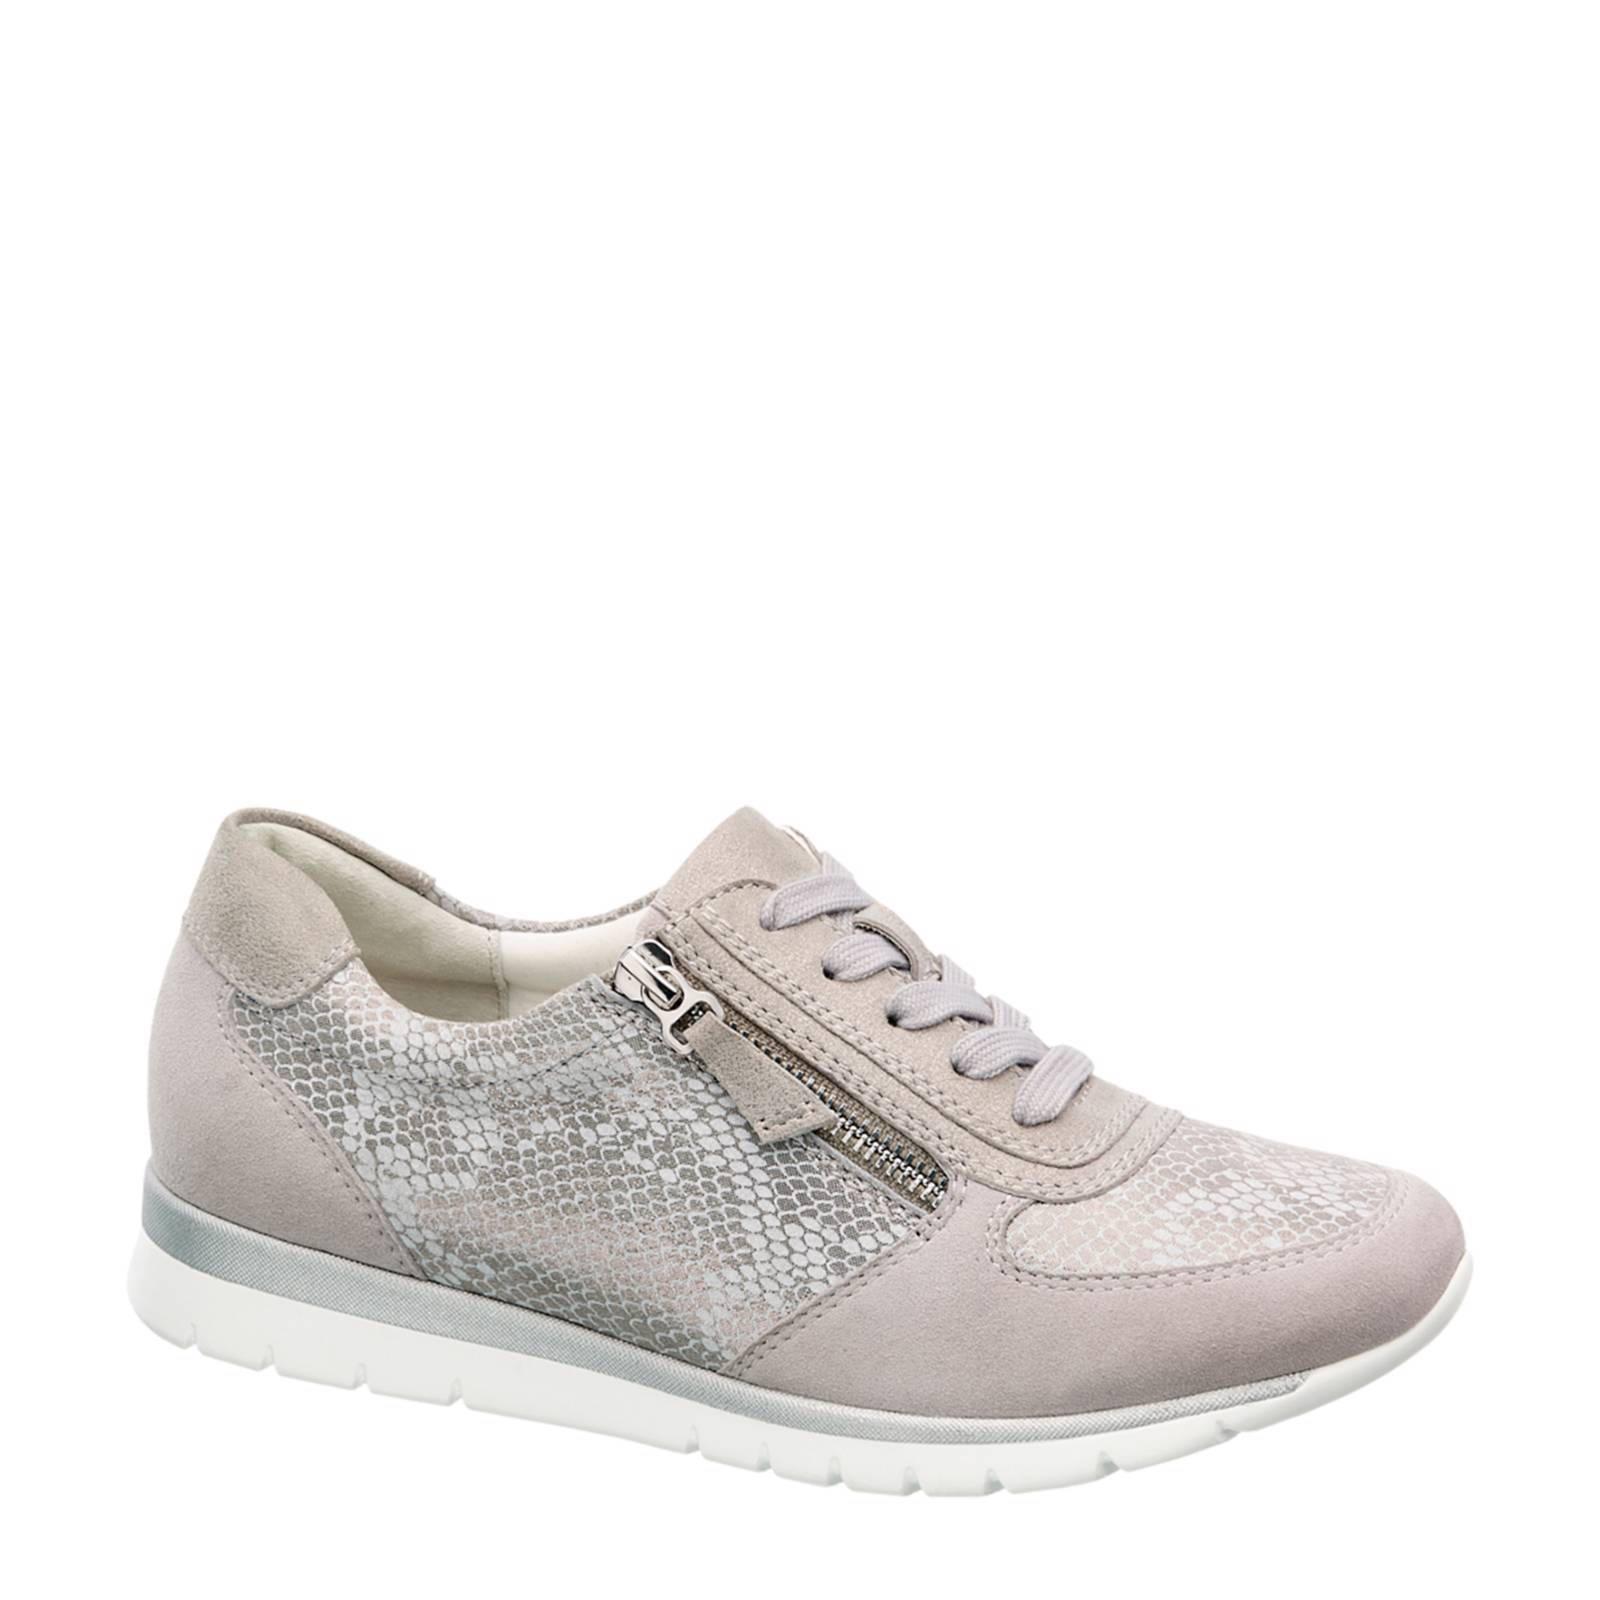 Chaussures De Médecin Gris kqZP3Z